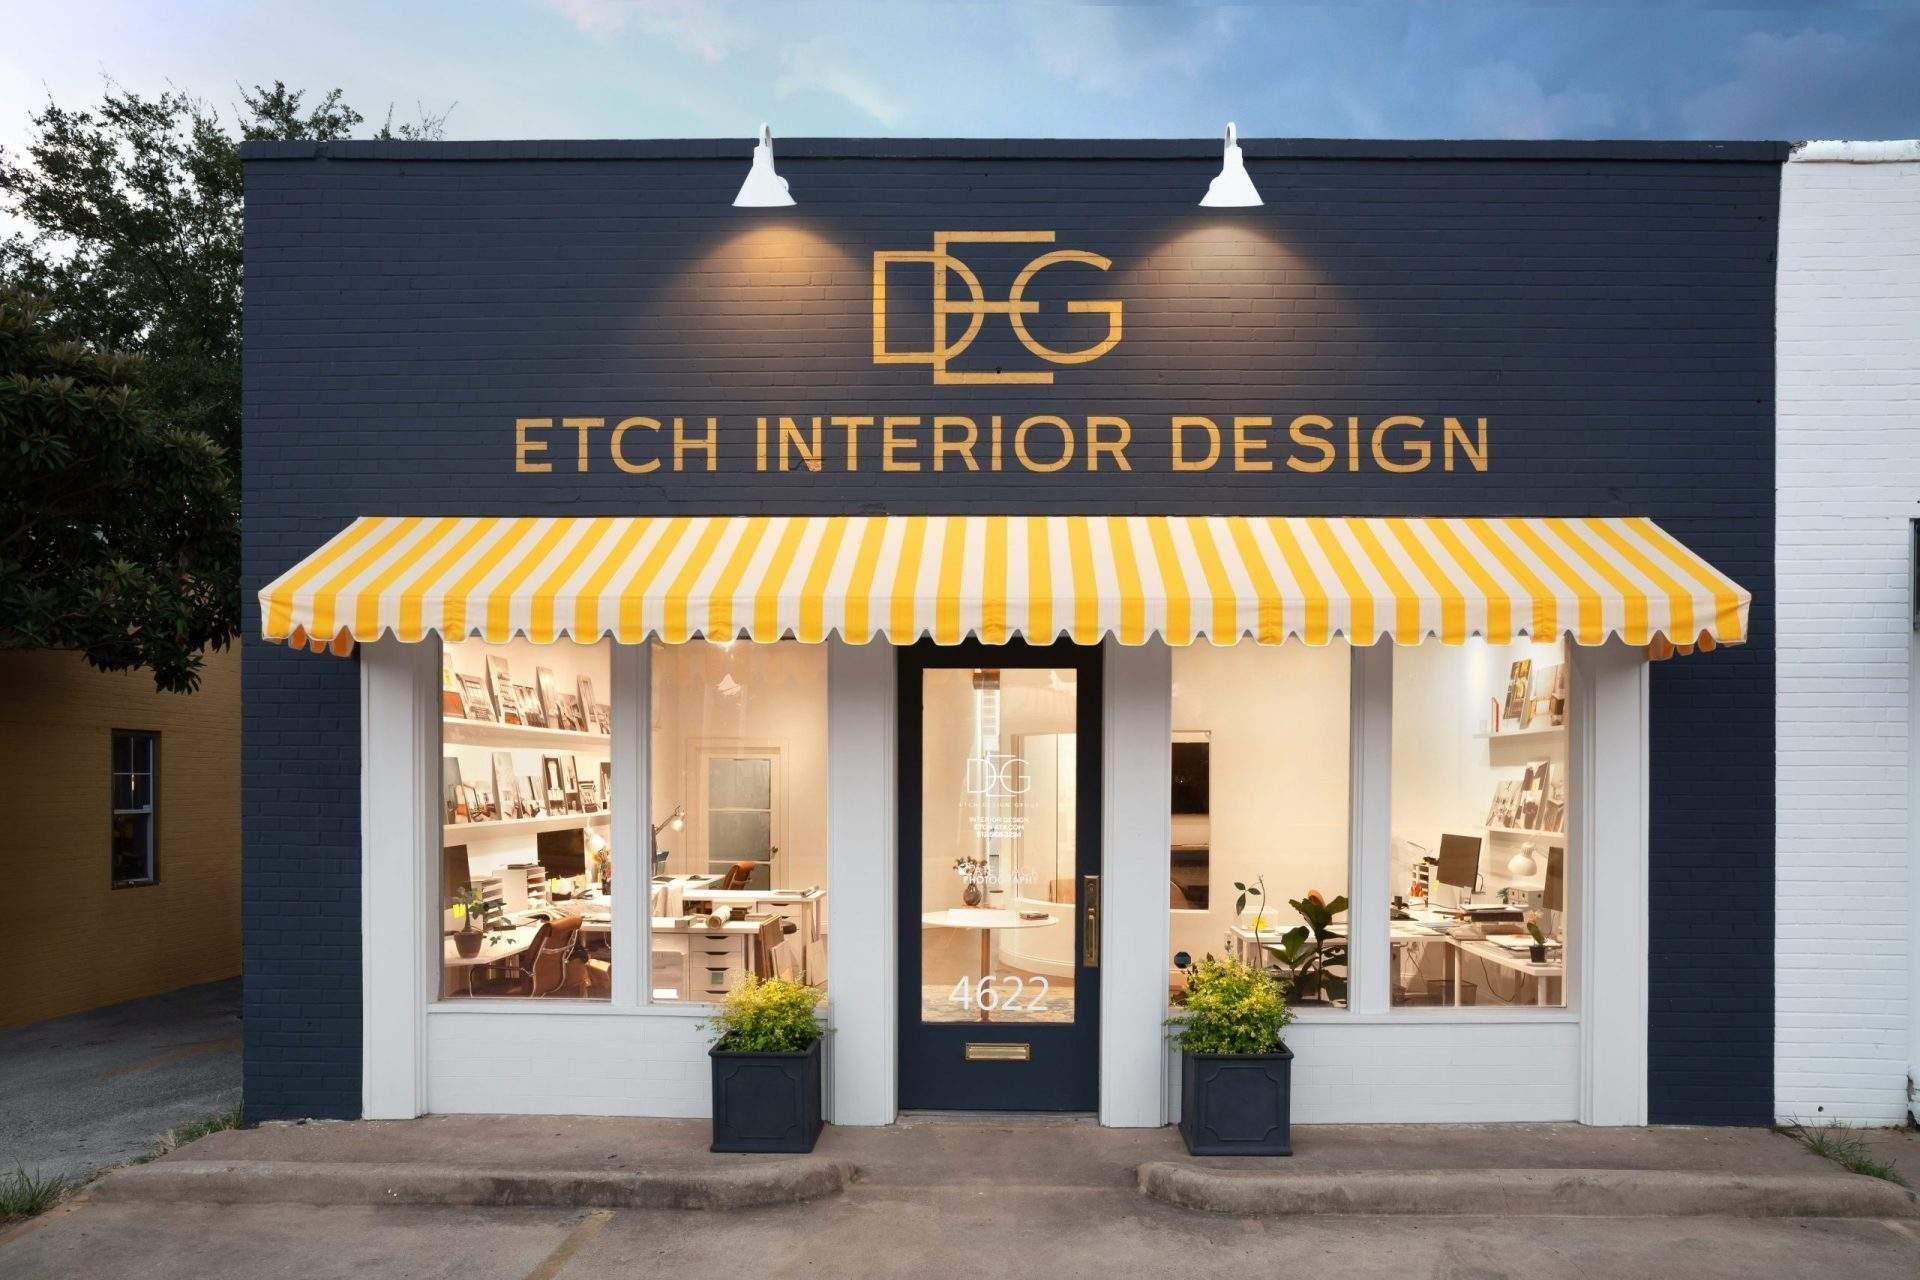 design austin | etch interior design exterior of office front view | austin, texas